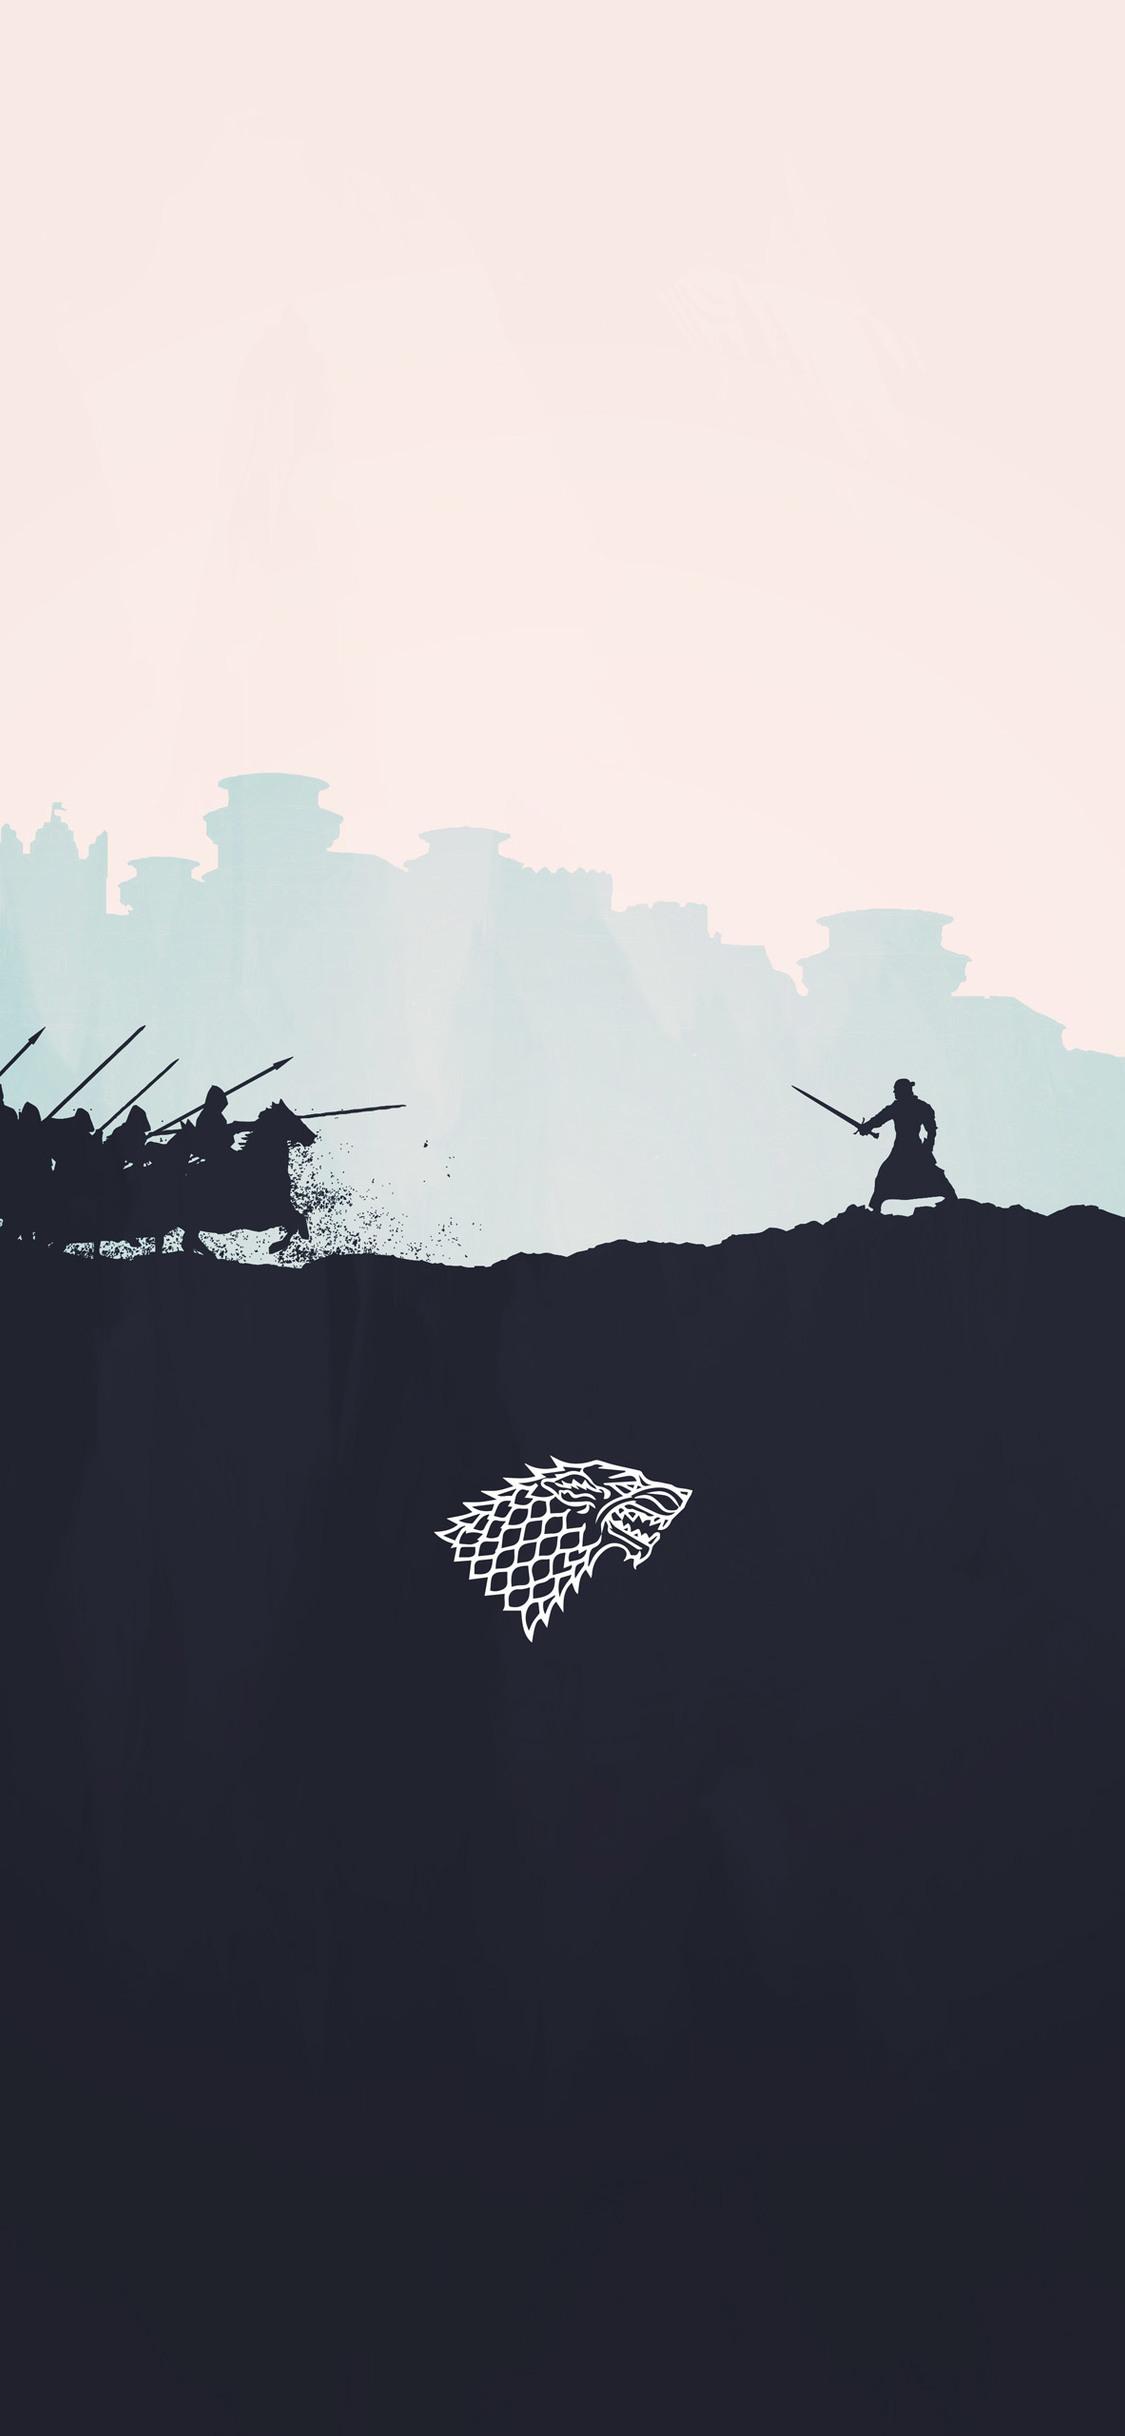 Wallpaper Of The Week 184 Best Game Of Thrones